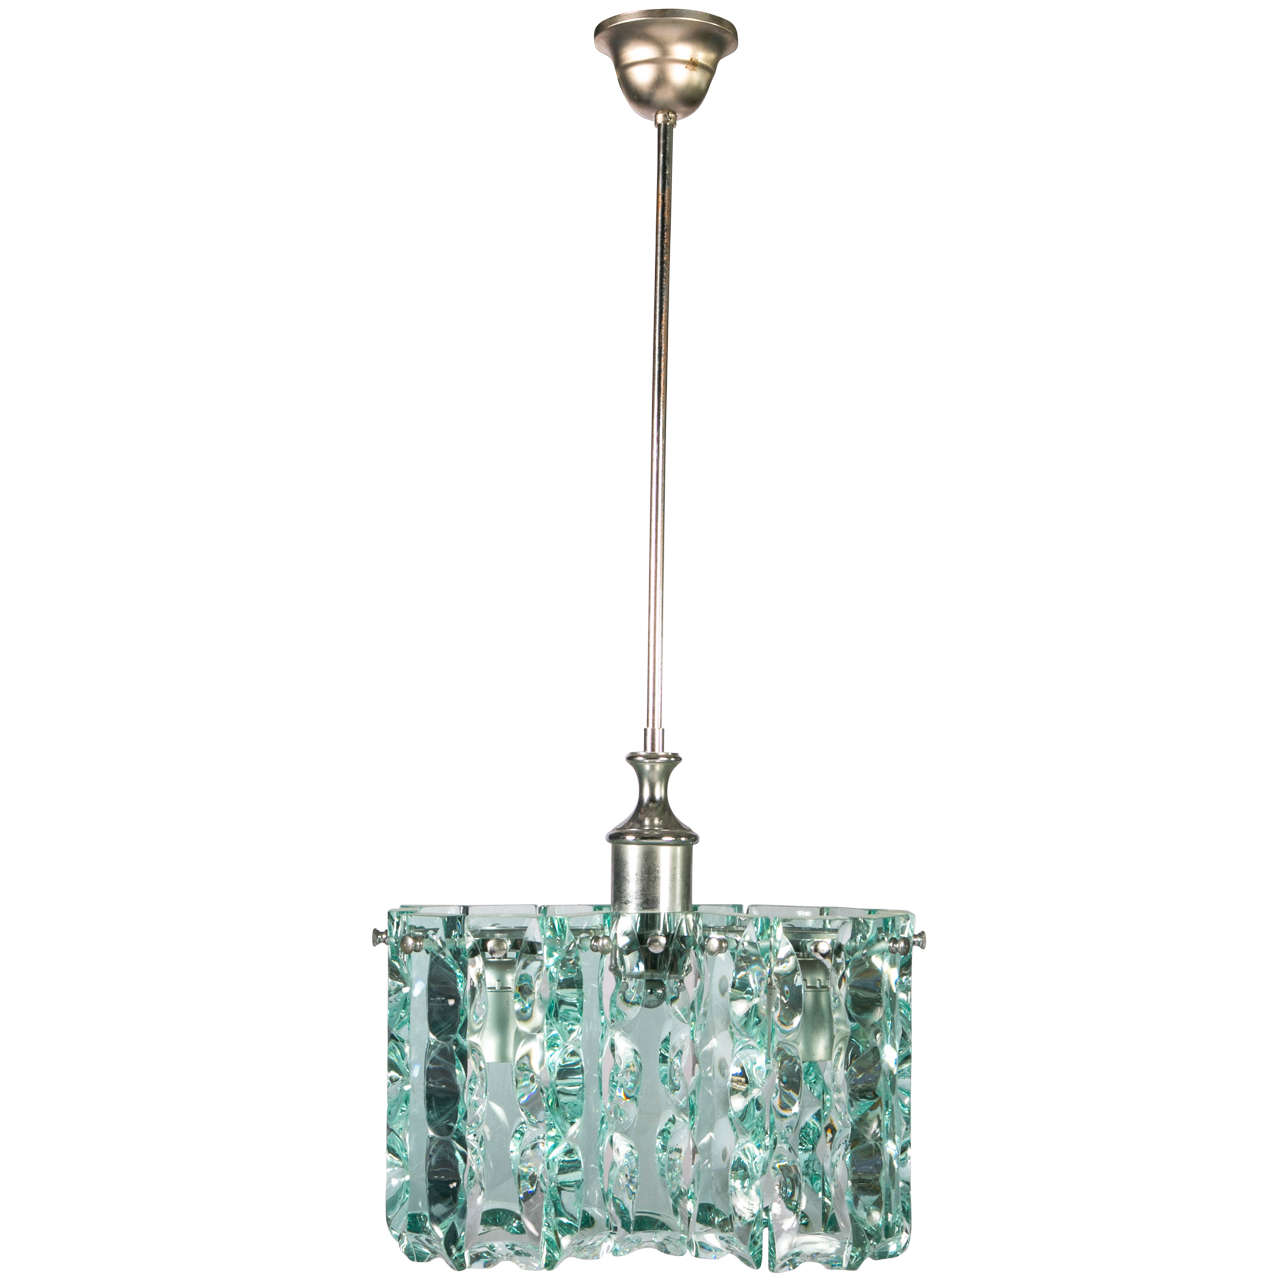 fontana arte style small chandelier at 1stdibs. Black Bedroom Furniture Sets. Home Design Ideas